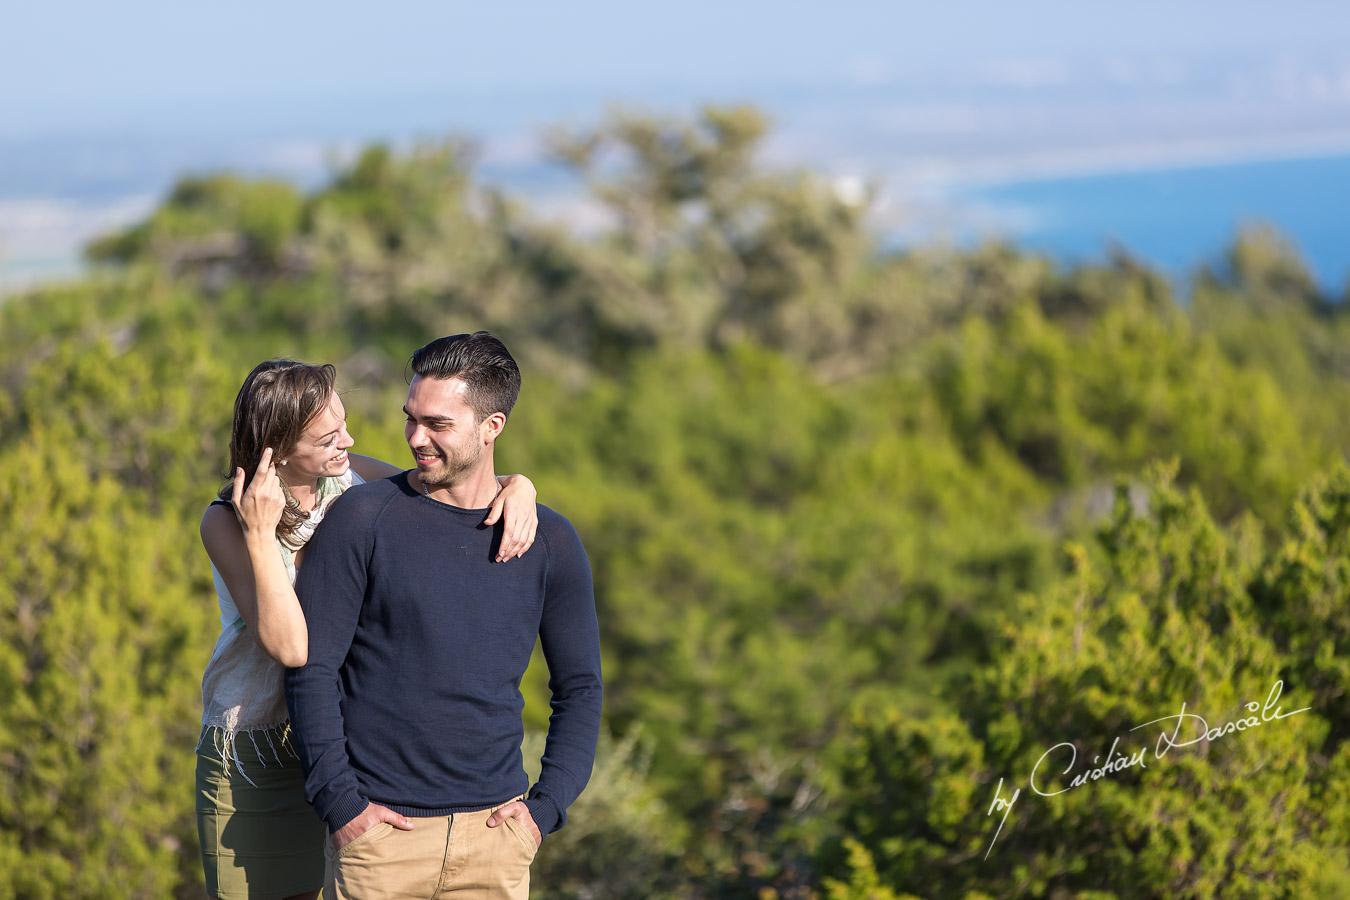 Love at first sight - Karen & Martins at Kurion Cyprus - 02